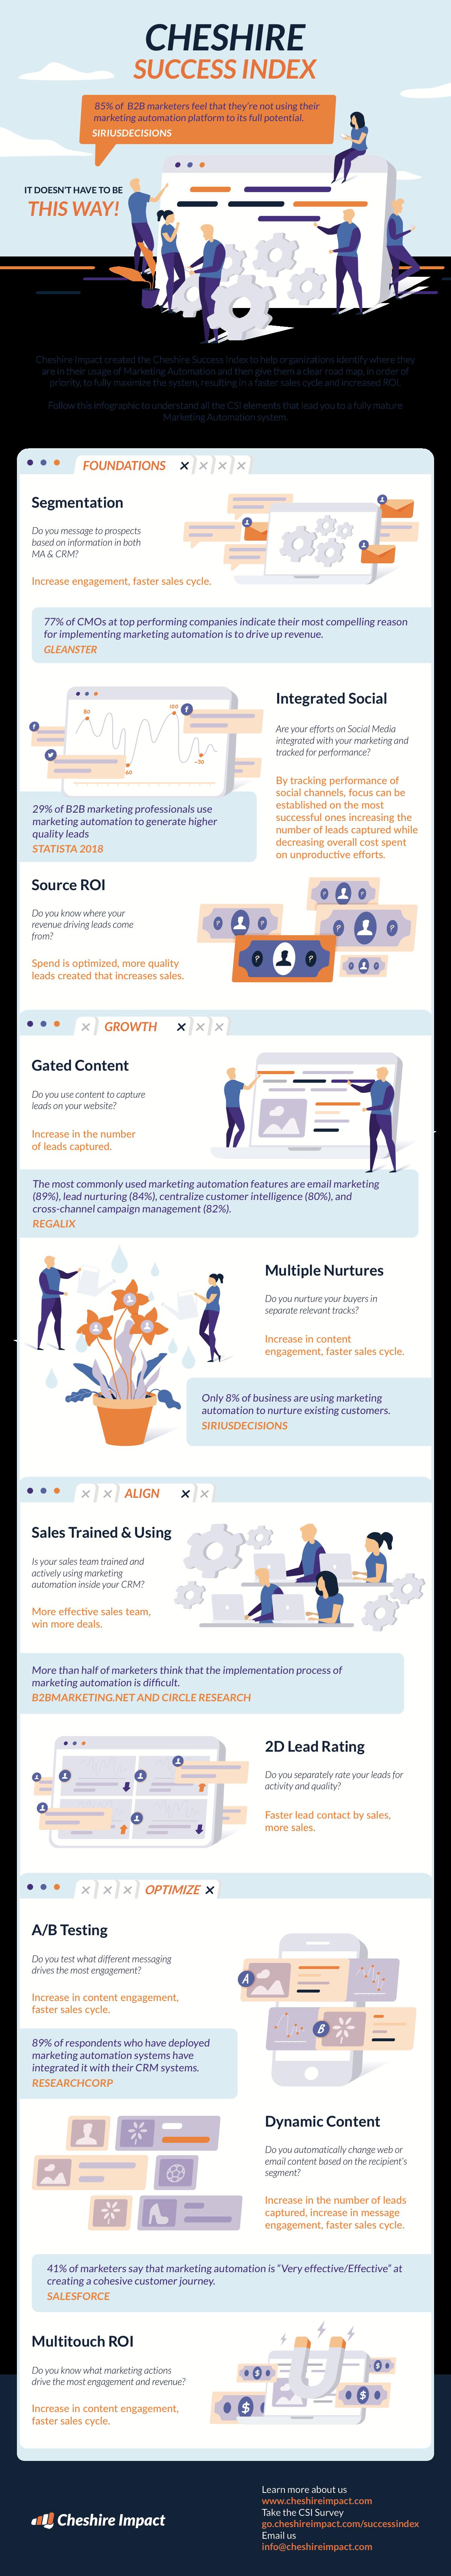 Company Infographic